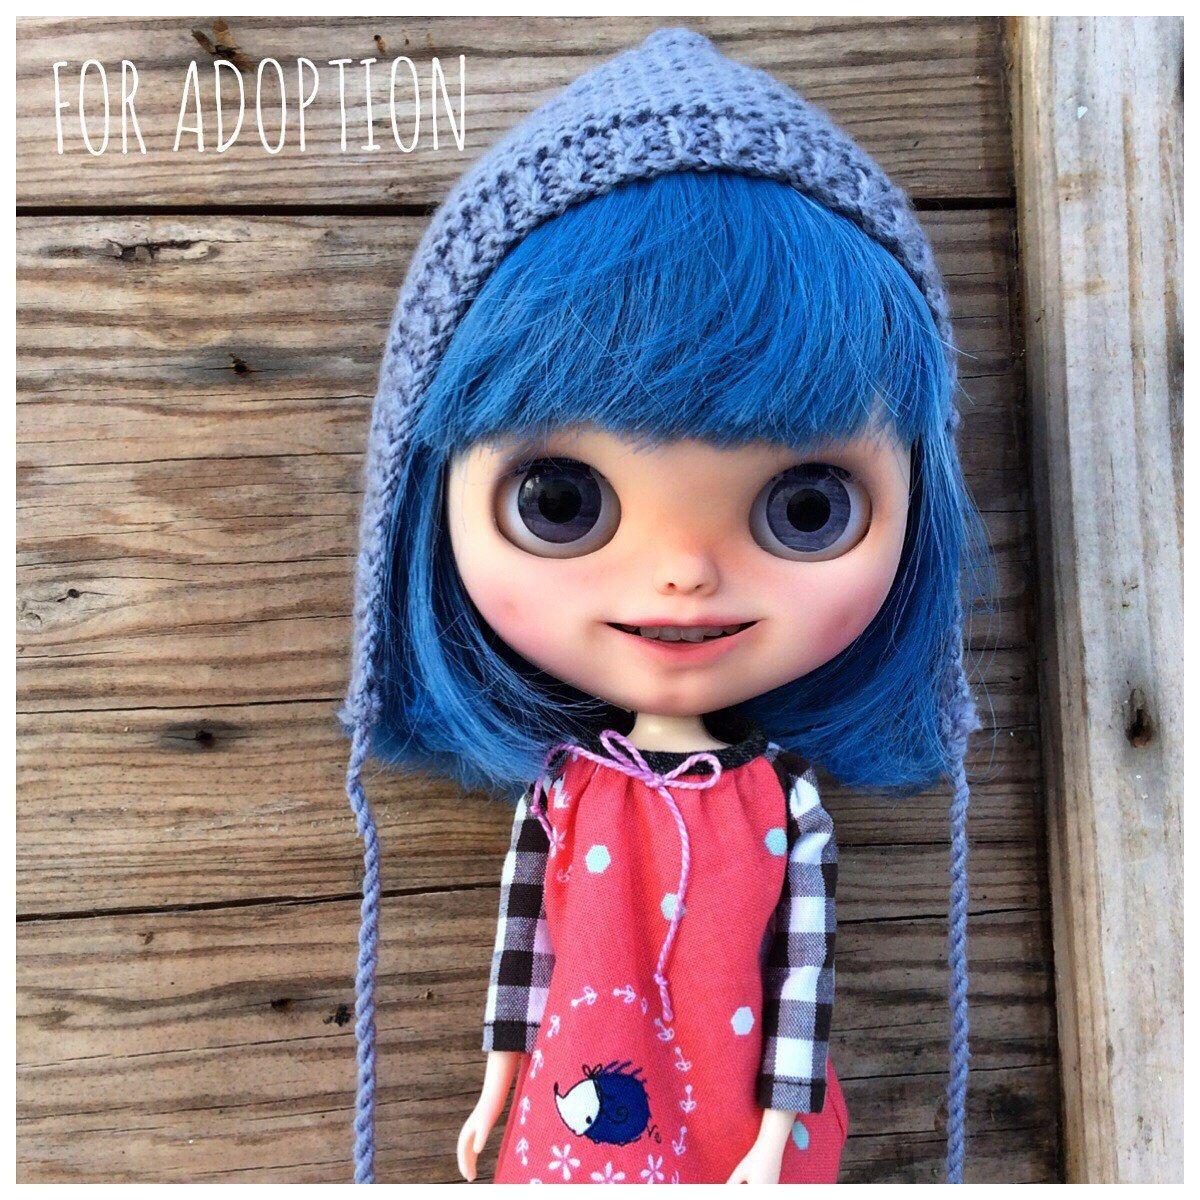 Muñecas Y Accesorios Blythe Doll Banochita Custom Original